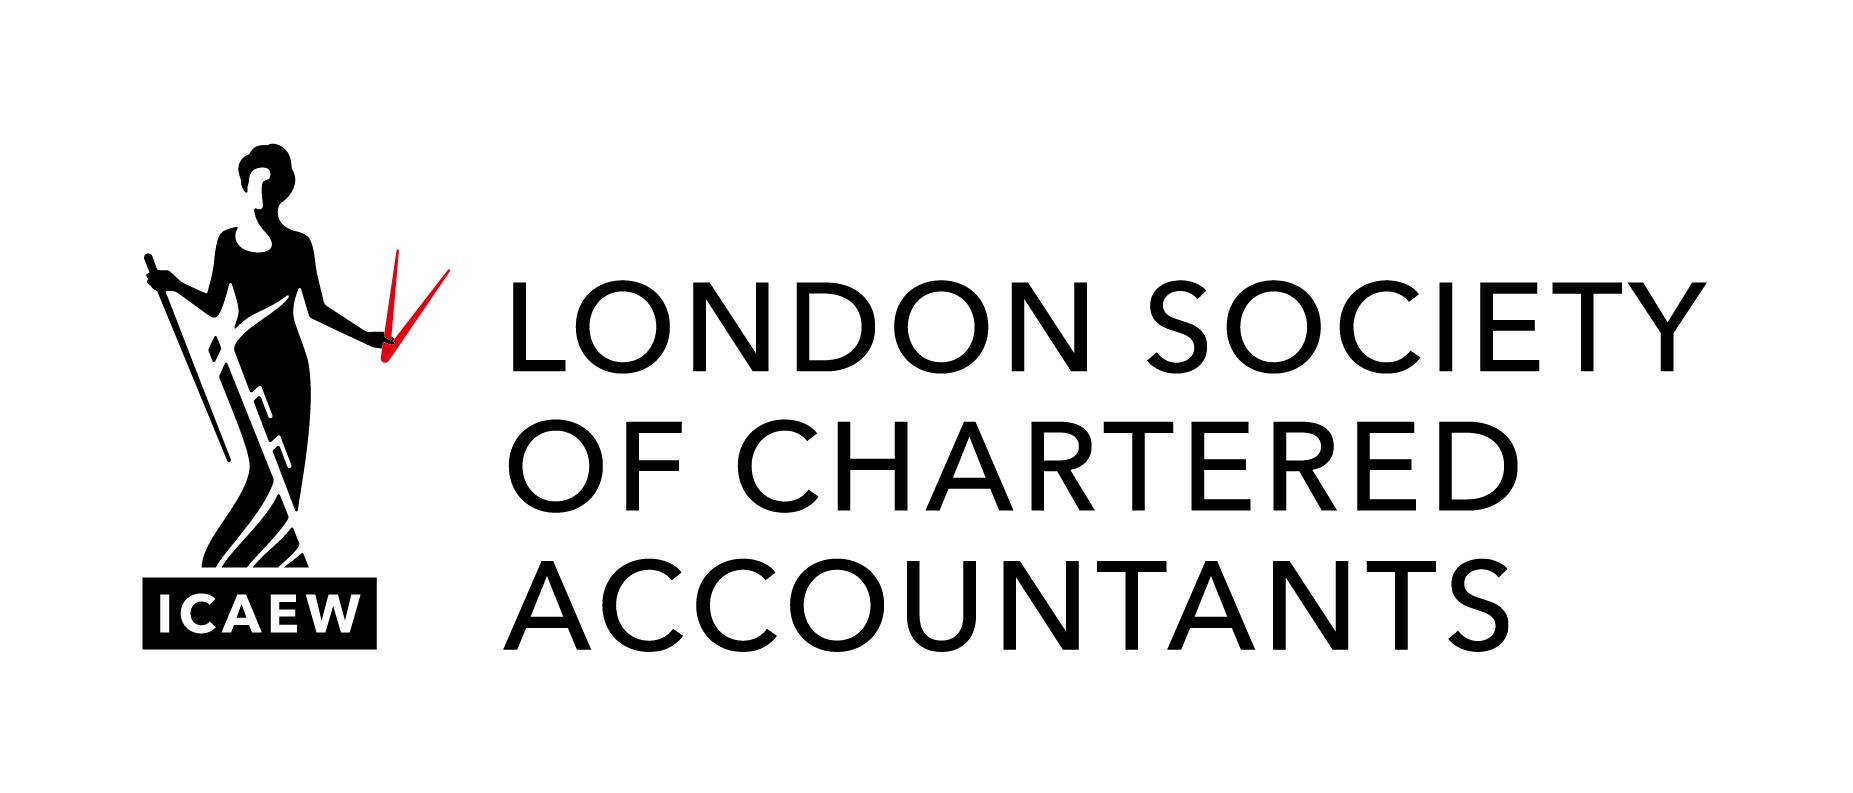 ICAEW LSCA Logo